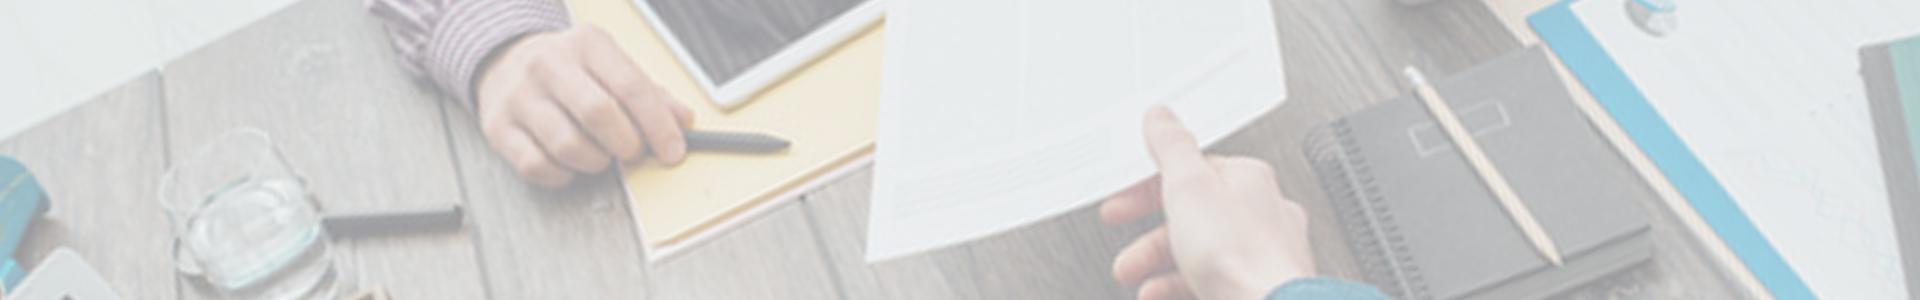 assurance dommages ouvrage que couvre t elle. Black Bedroom Furniture Sets. Home Design Ideas